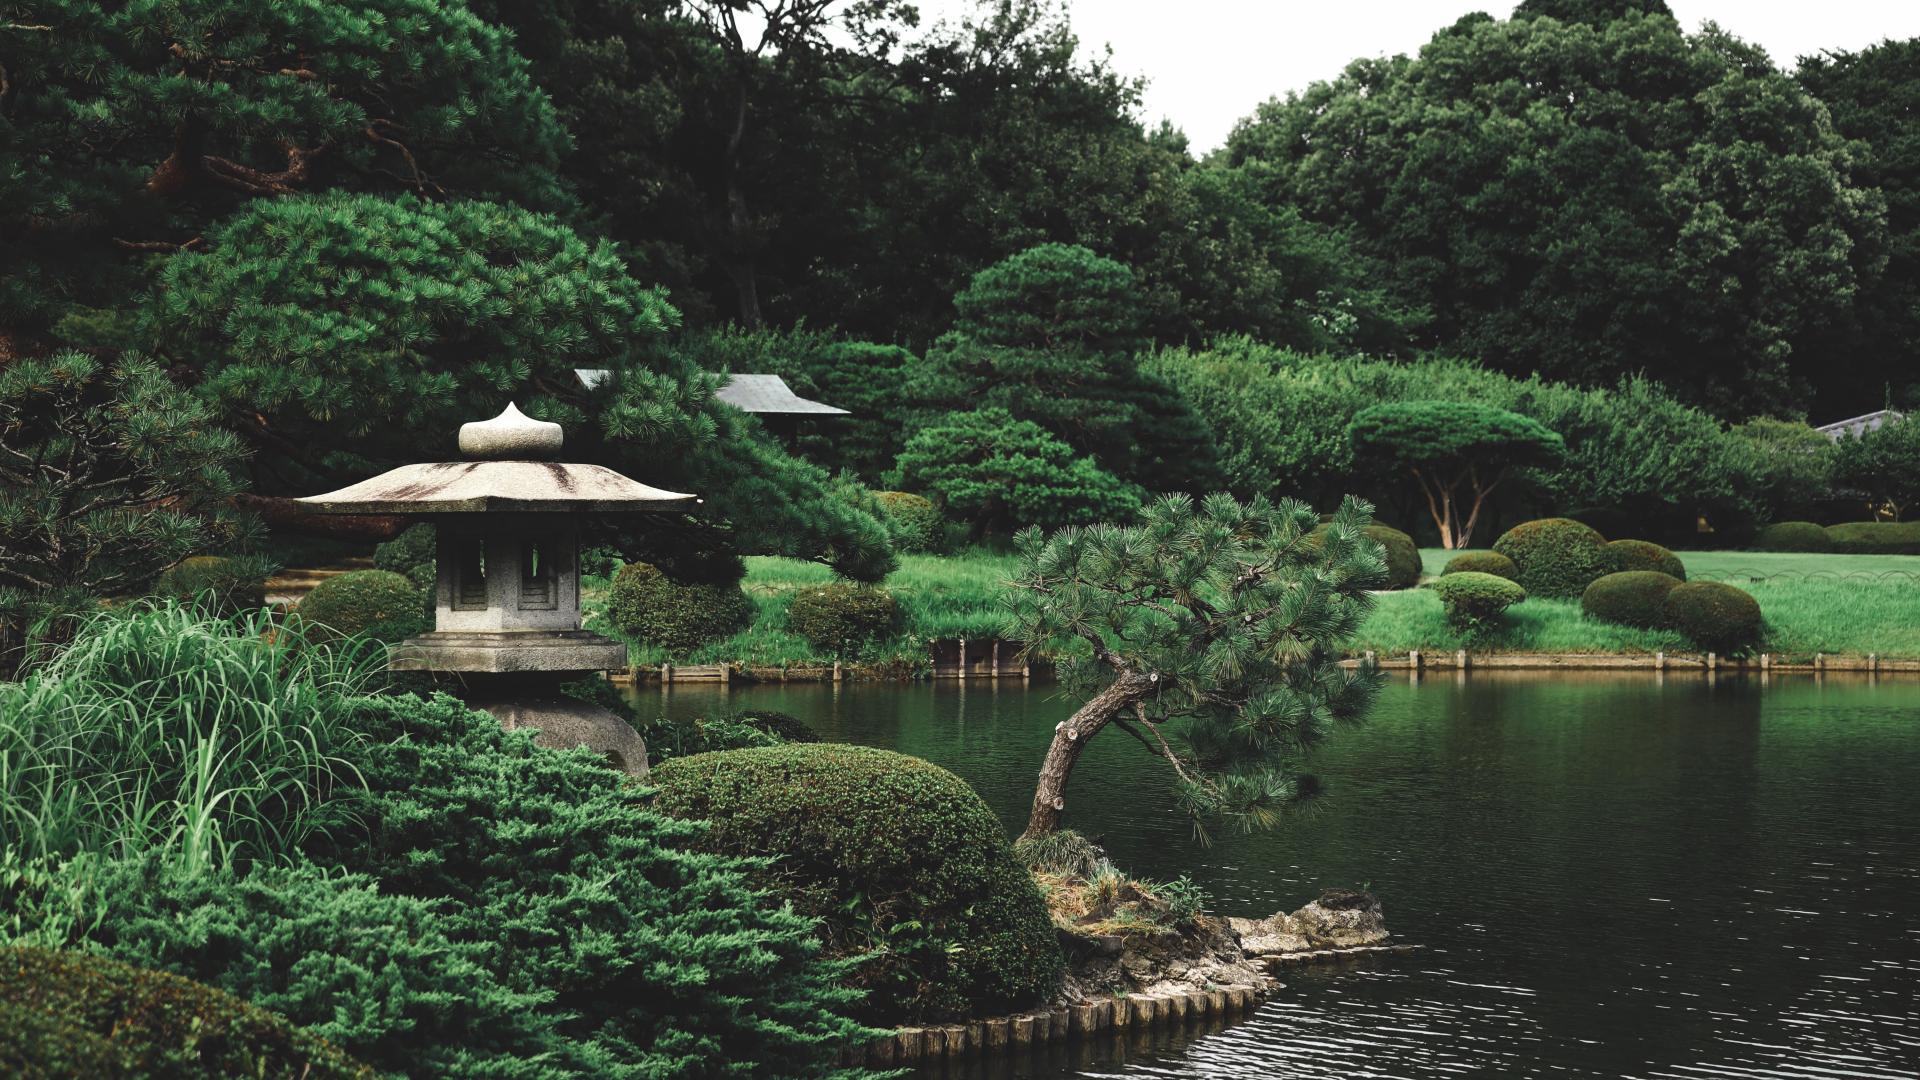 Zen-Garten, Japan, Meditation